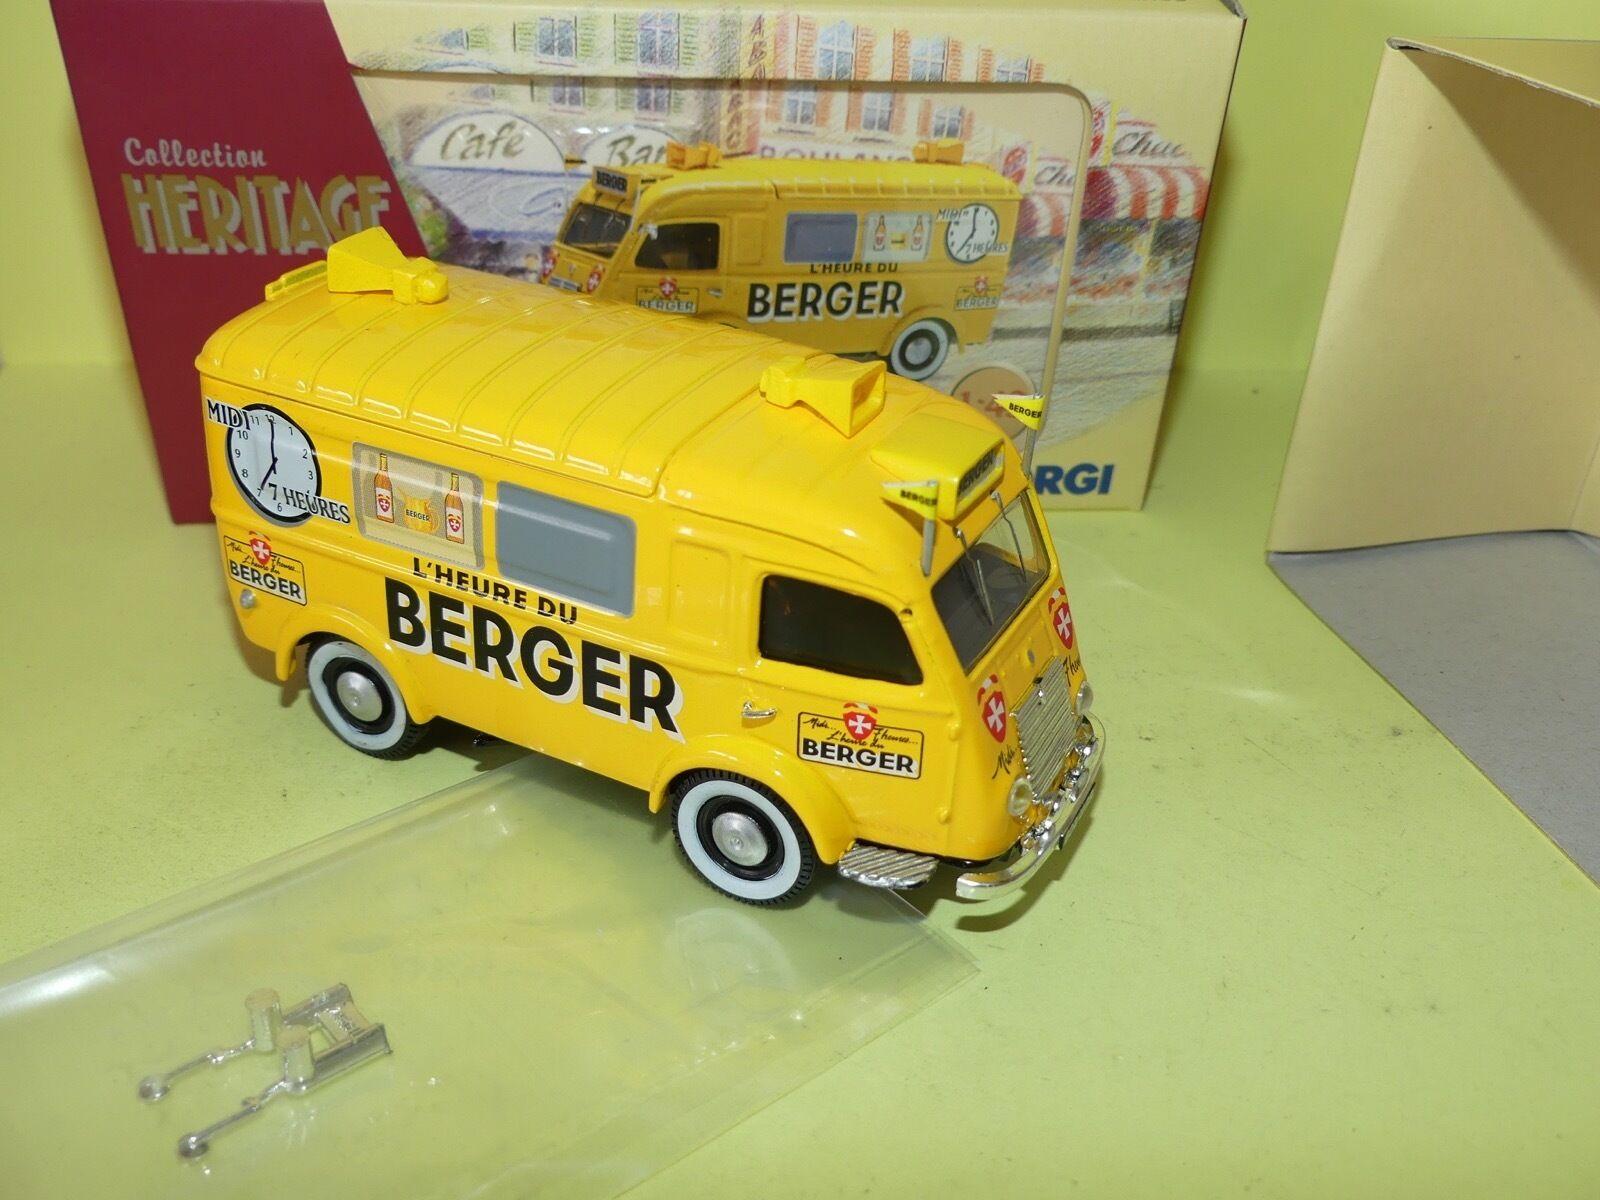 RENAULT 1000 Kg L'HEURE DU BERGER CORGI EX70532 1 43